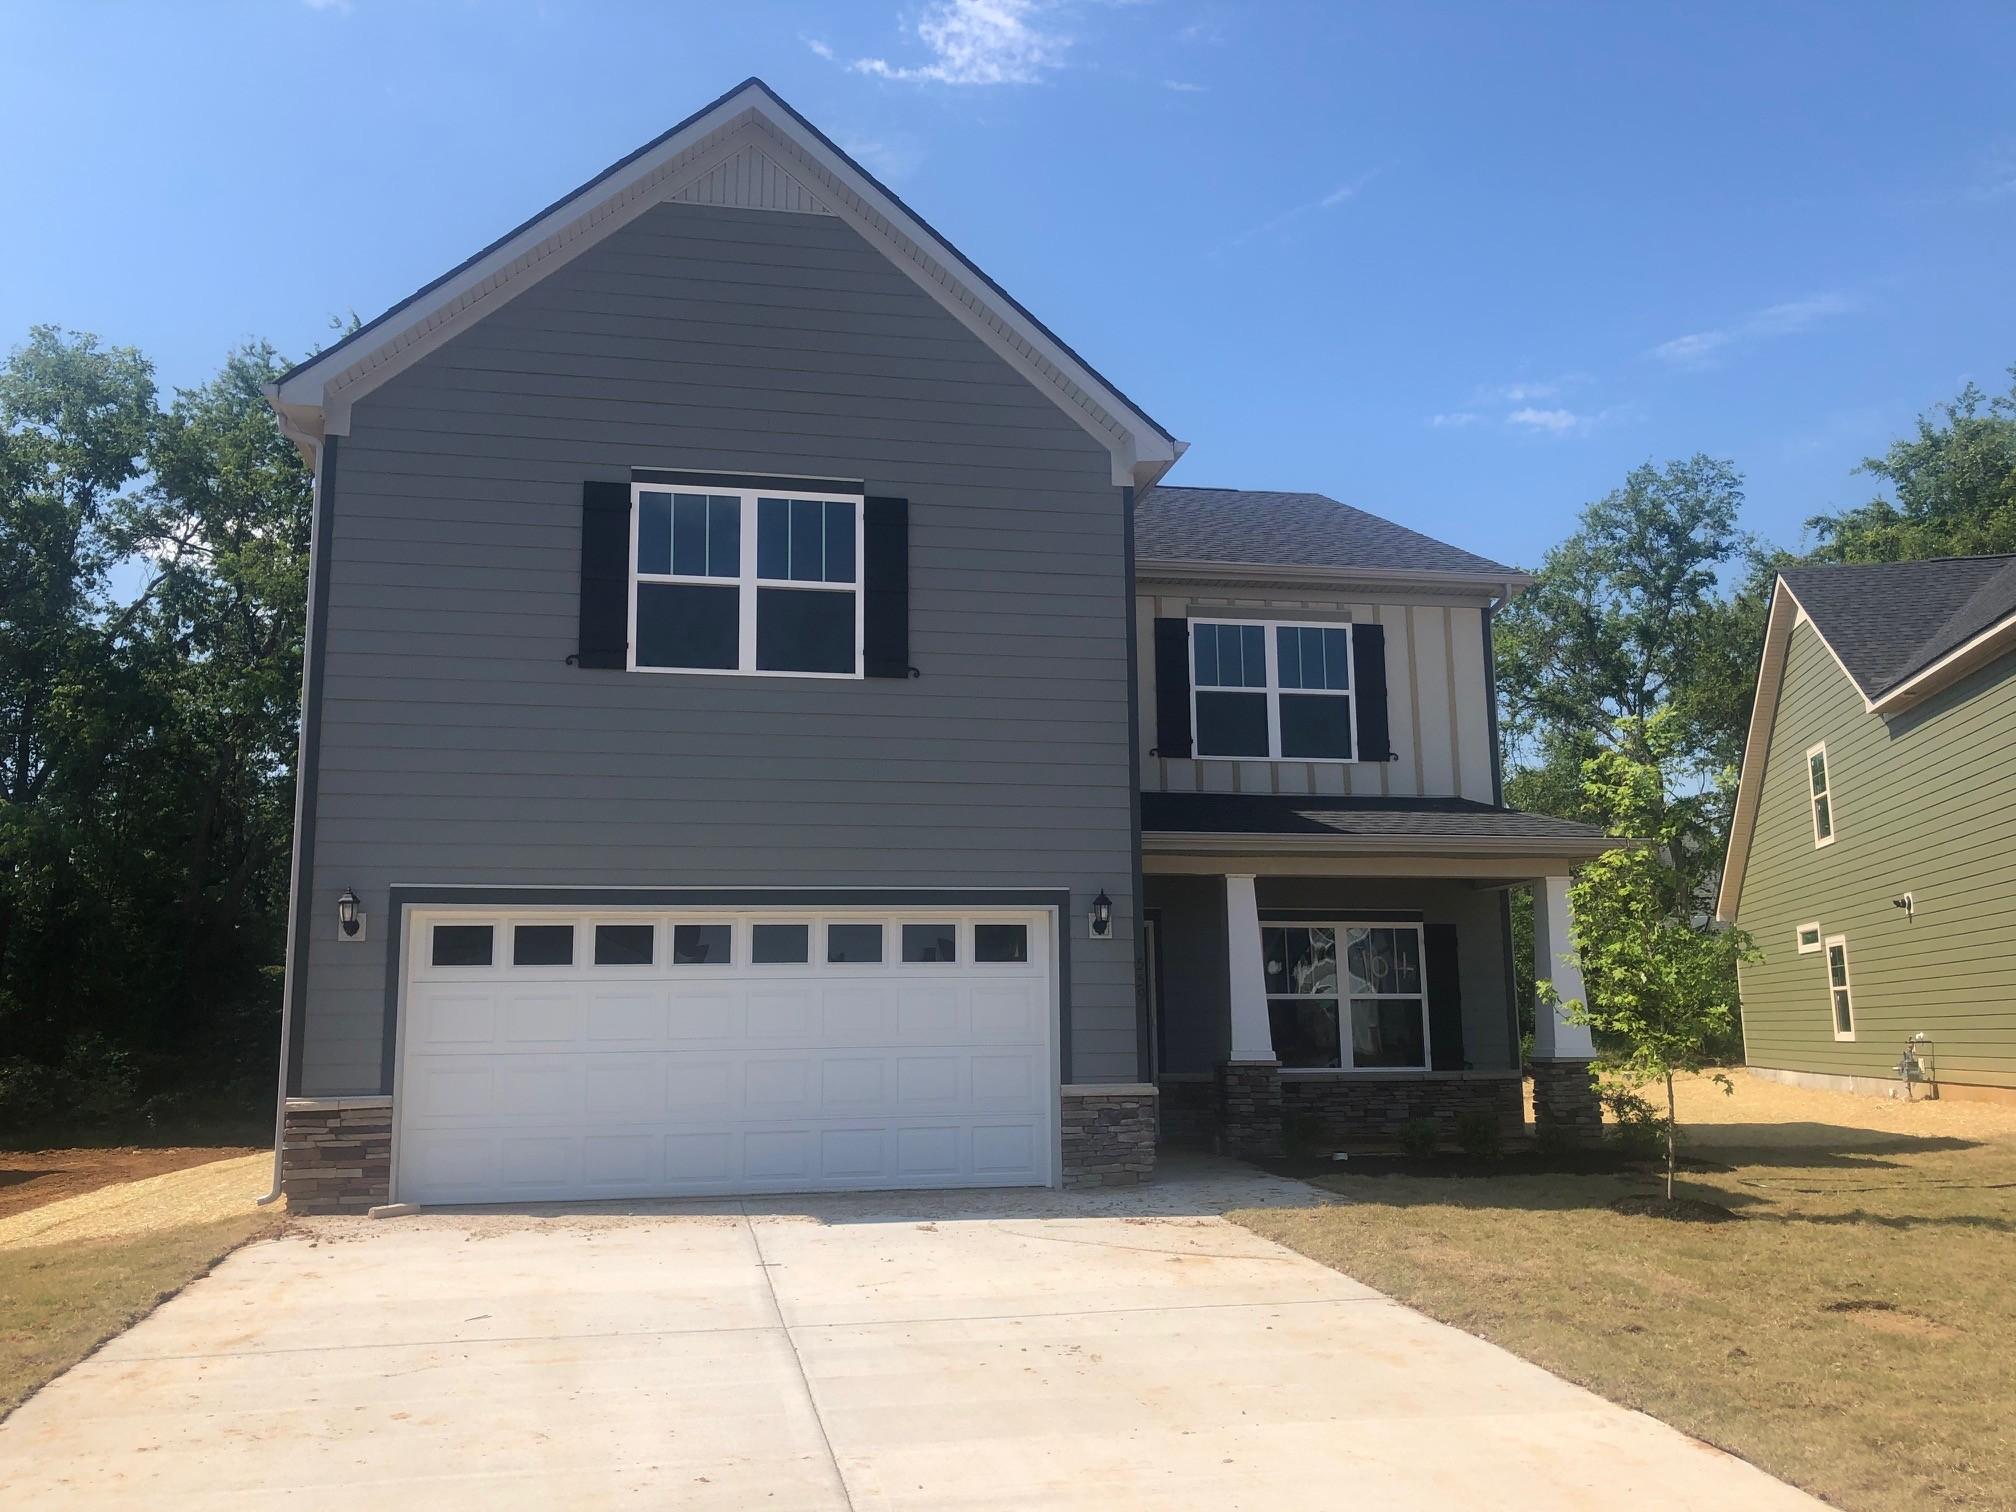 559 High Echelon Cir(lot 104), Smyrna, TN 37167 - Smyrna, TN real estate listing